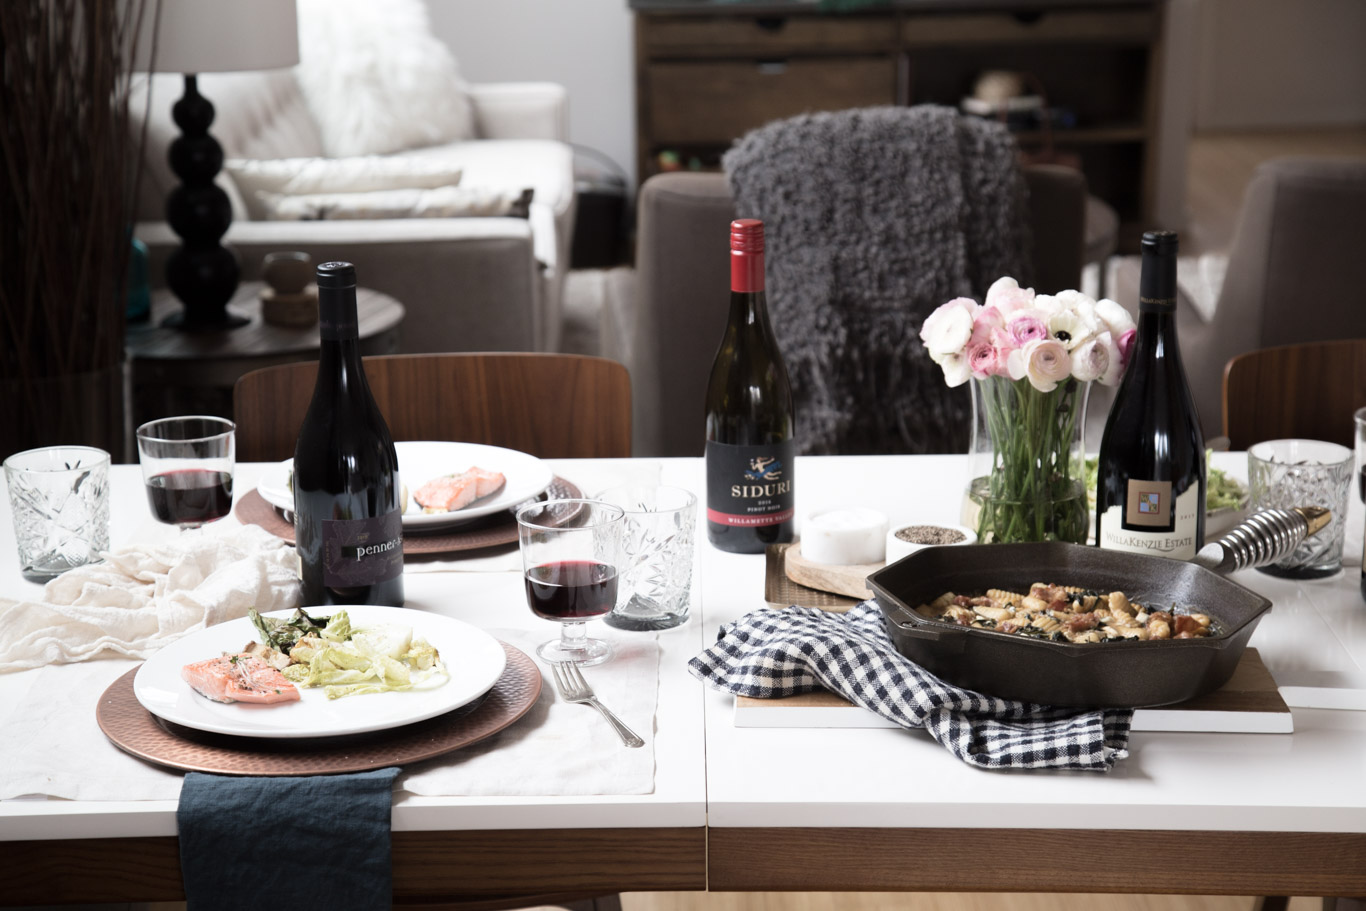 Dinner table set up for Oregon Wine Month dinner